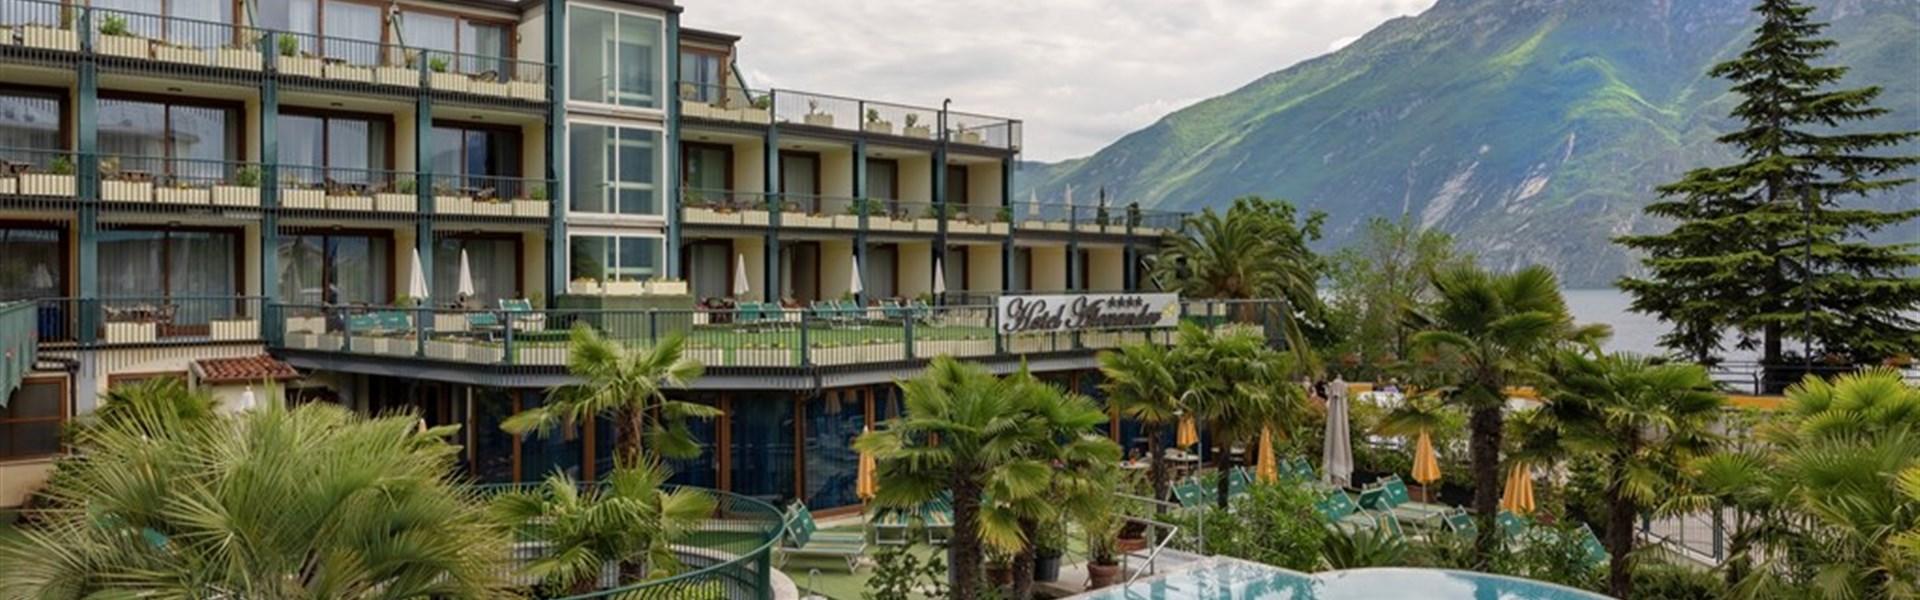 Hotel Alexander -